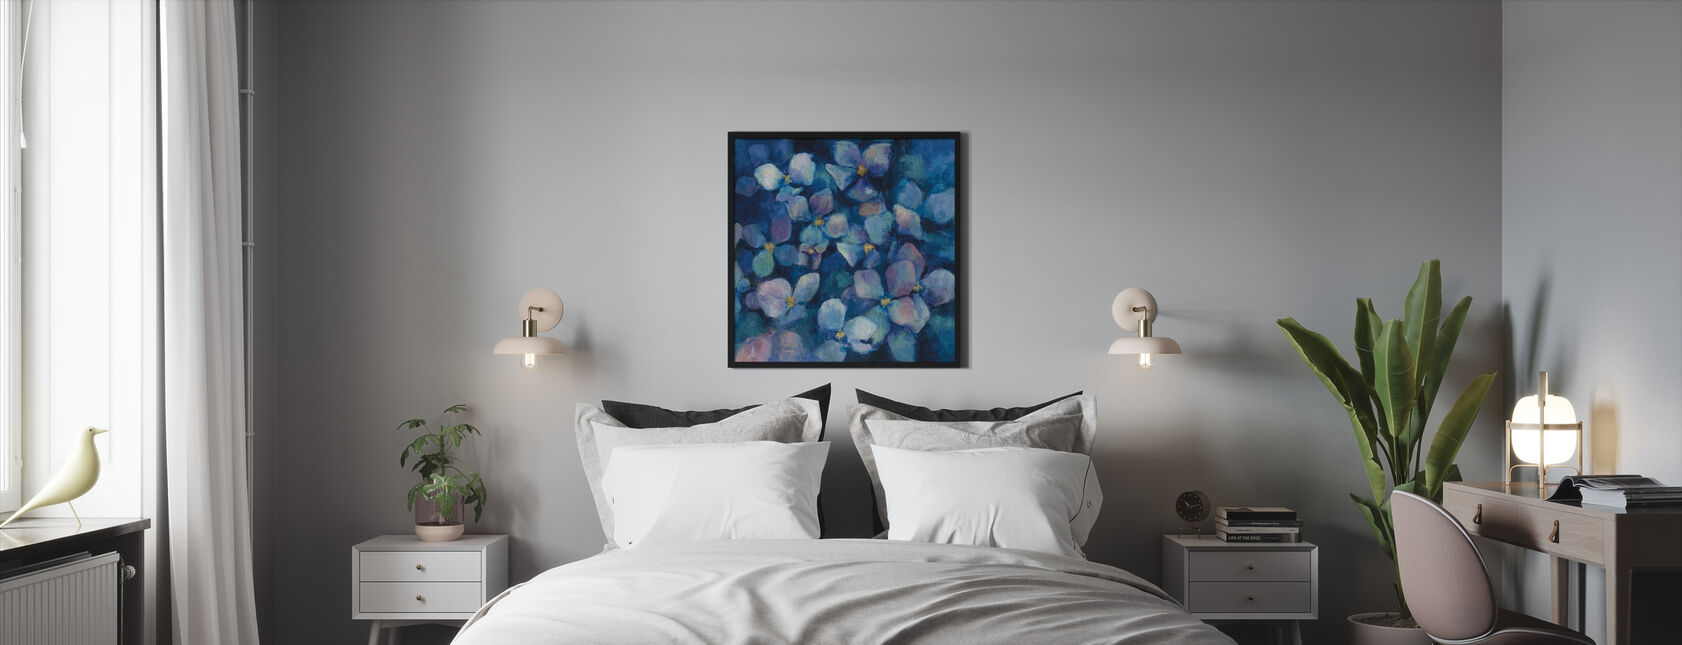 Midnight Blue Hydrangeas with Gold - Framed print - Bedroom